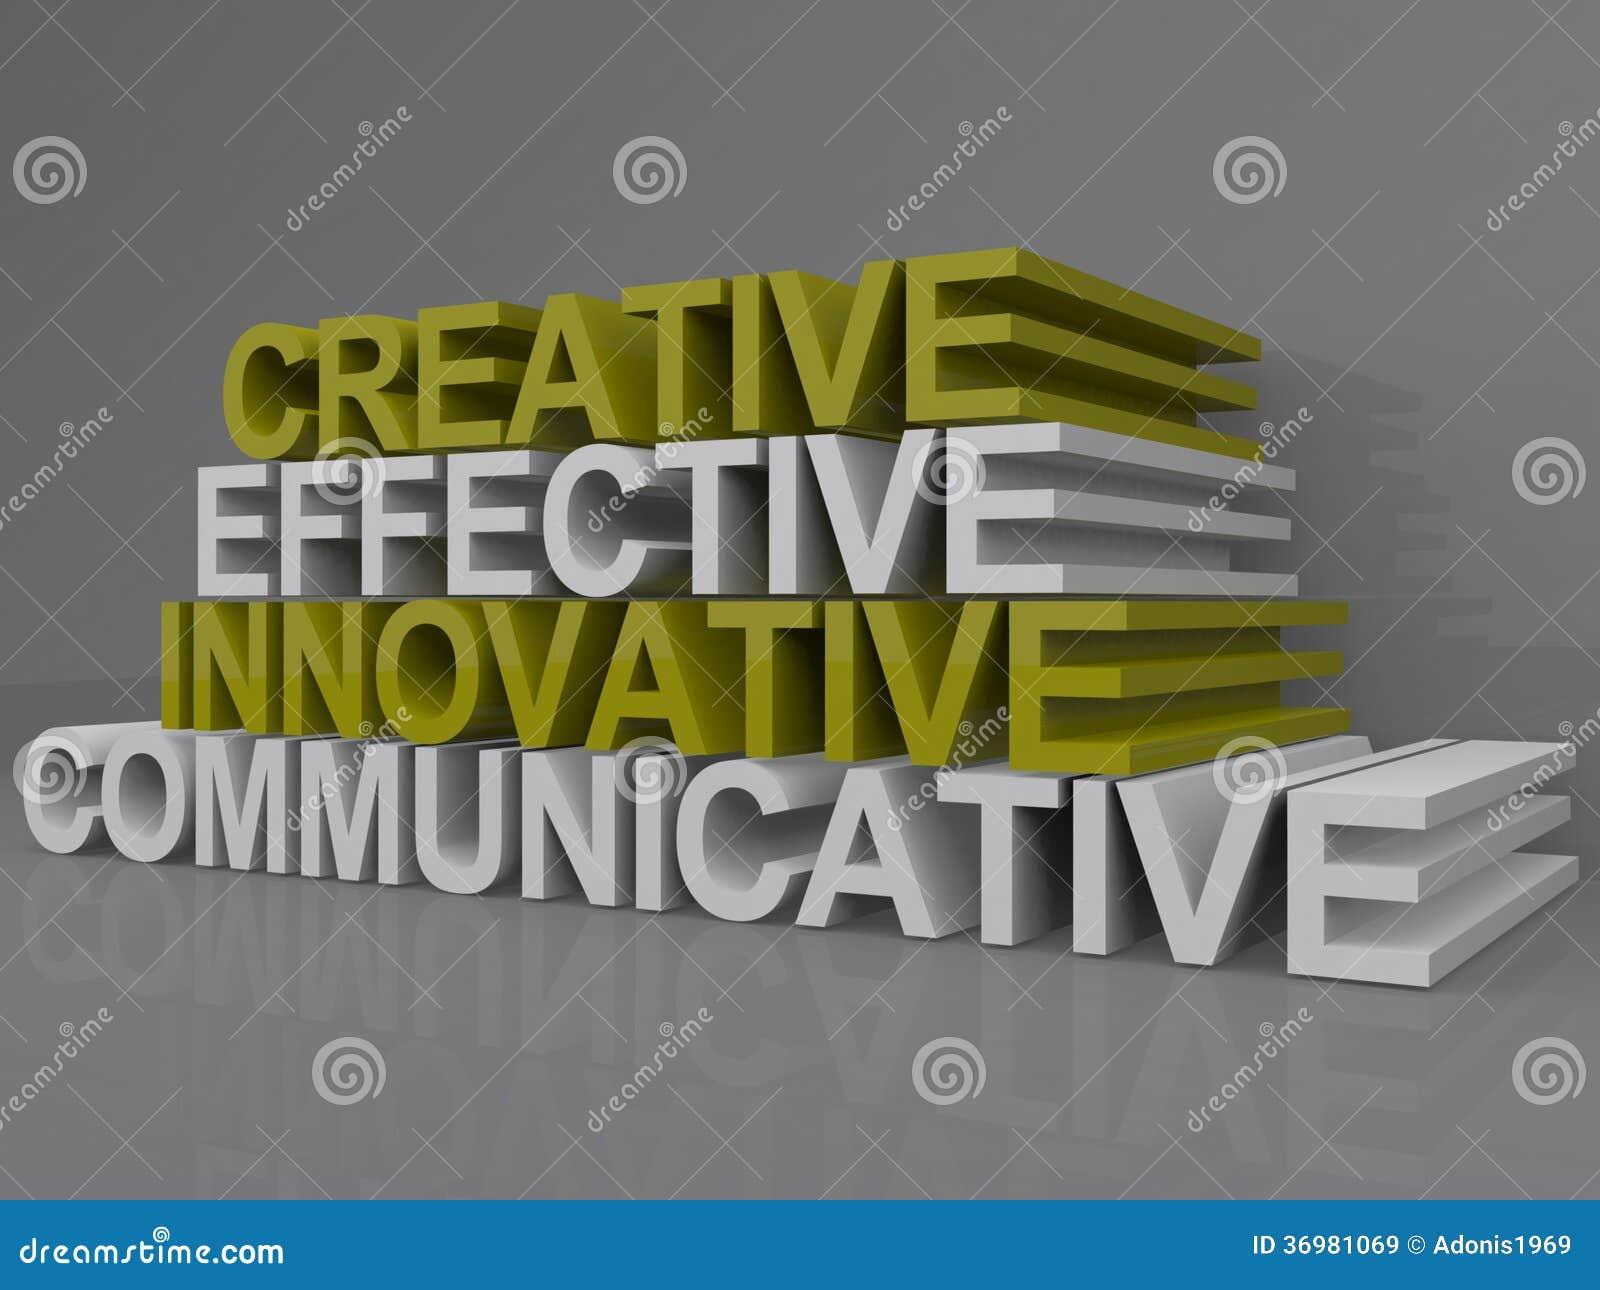 Communicatif Innovateur Efficace Cratif